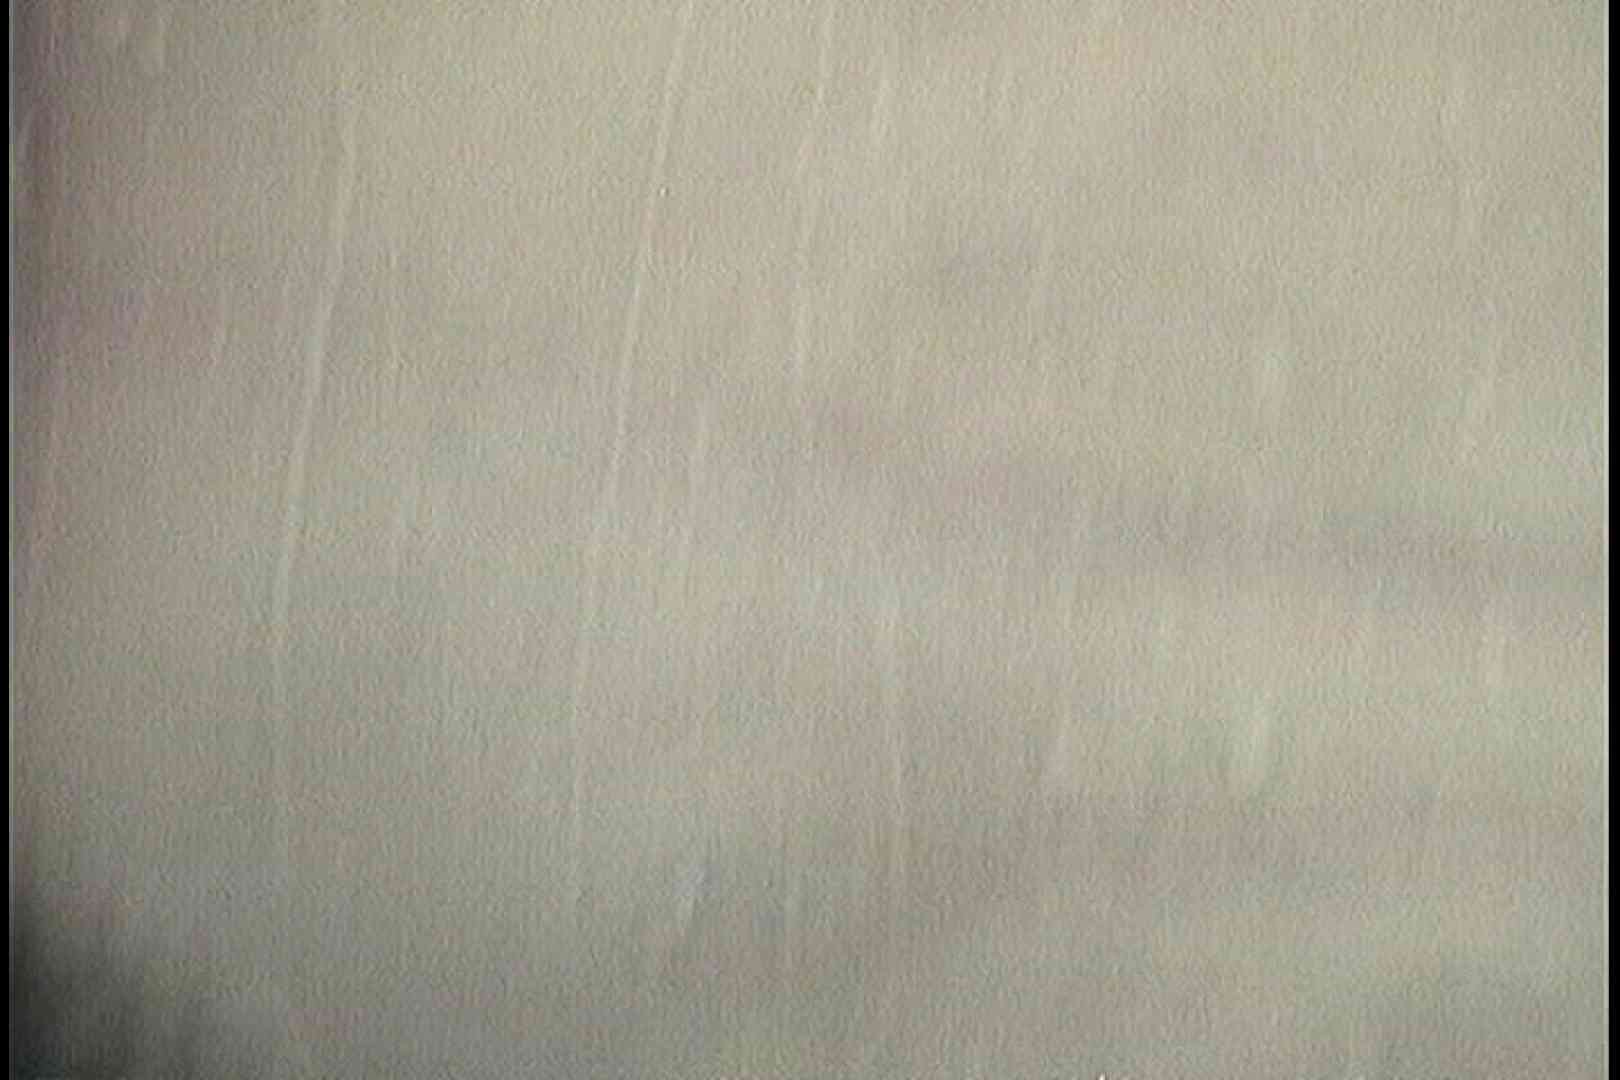 No.24 ビキニの割には陰毛は獰猛、ハミ毛が心配 接写 | 0  108画像 55